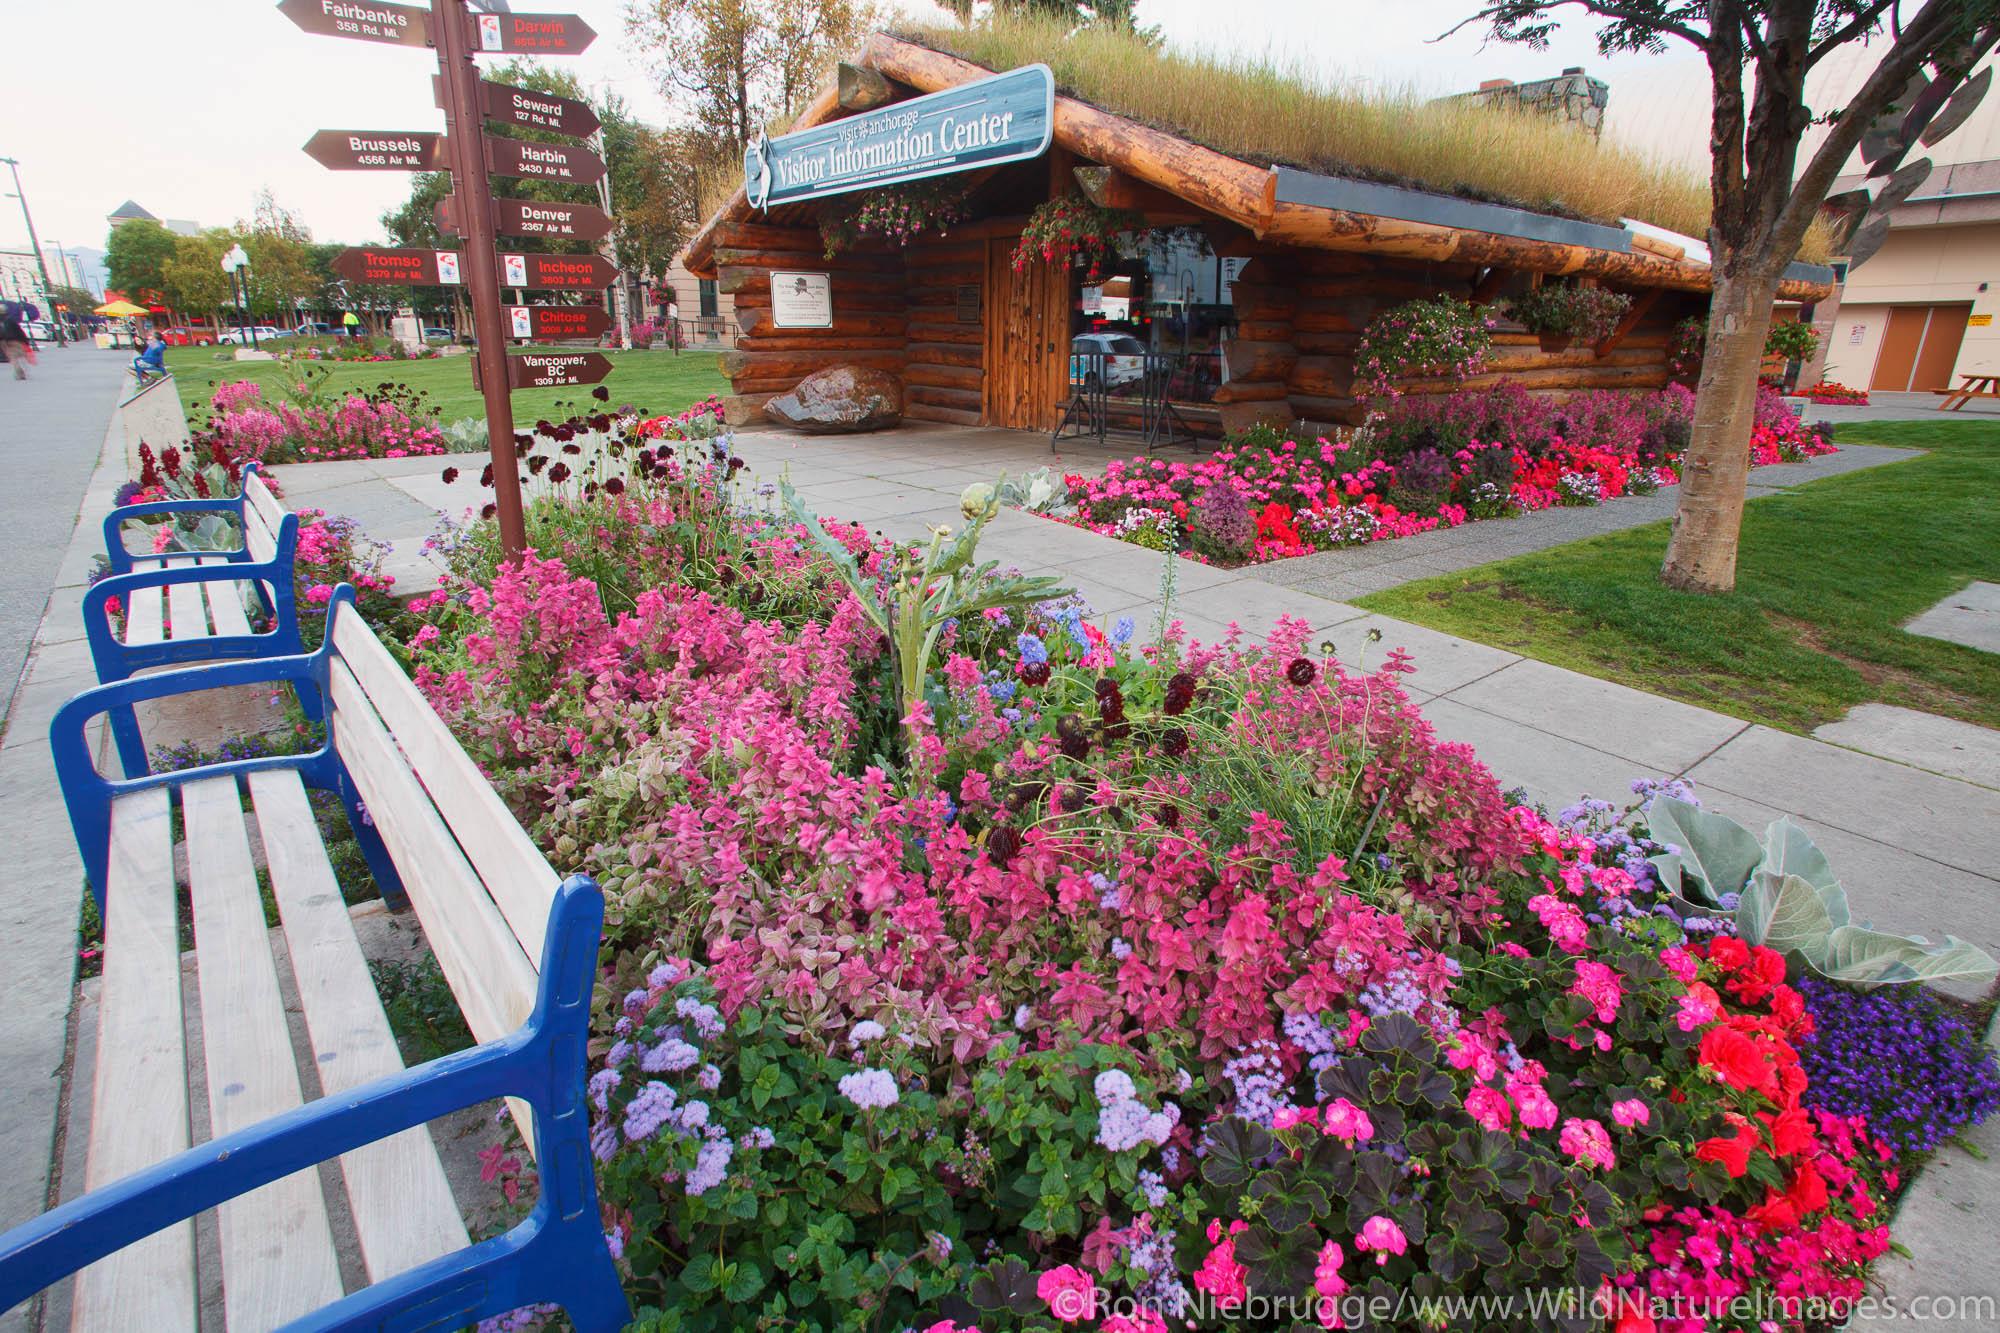 Visitor Information Center, downtown Anchorage, Alaska.